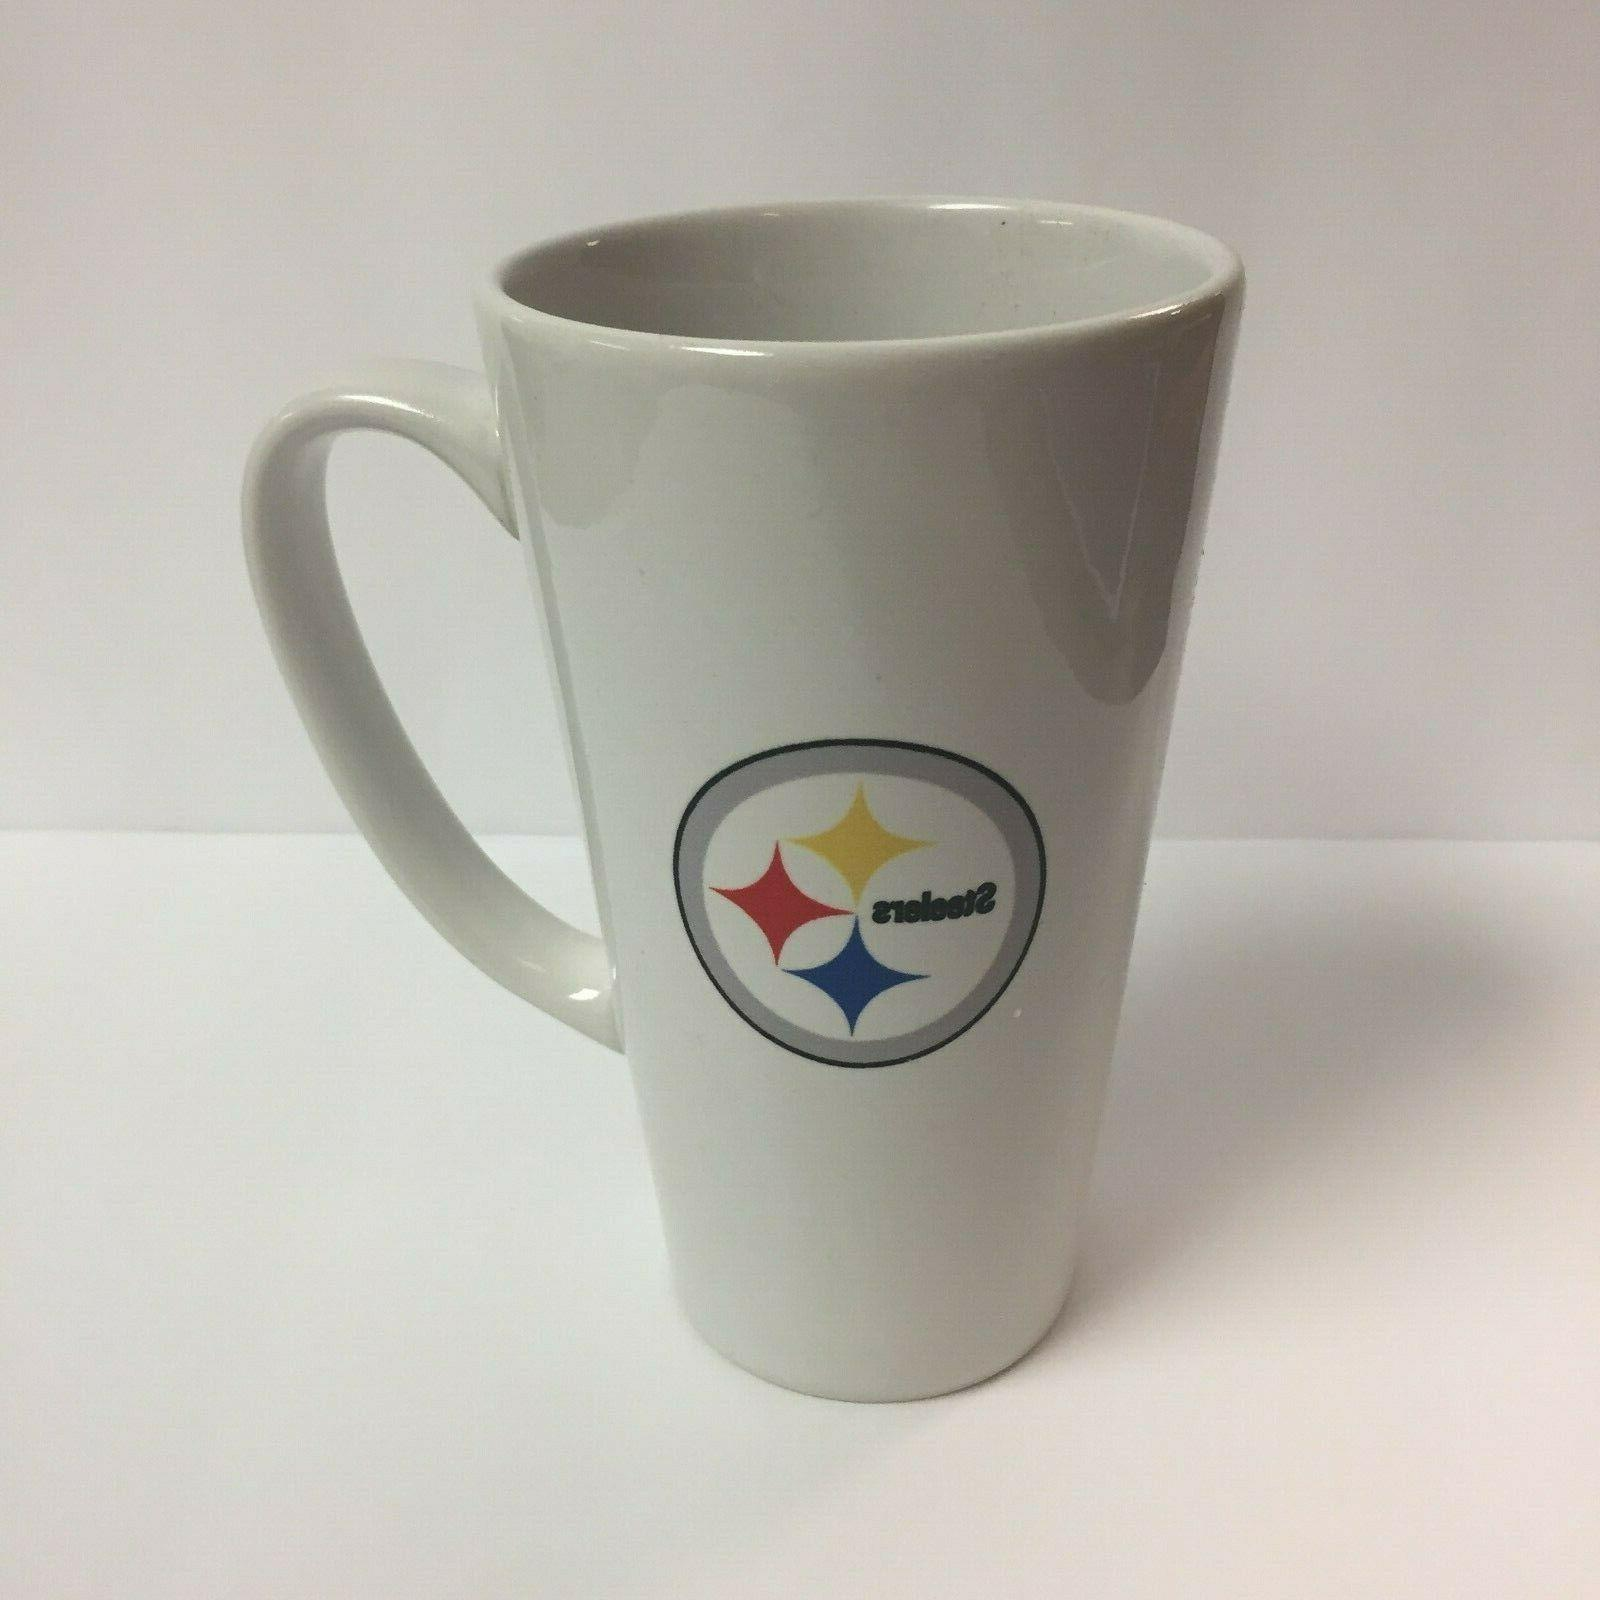 pittsburgh steelers new tall latte coffee mug